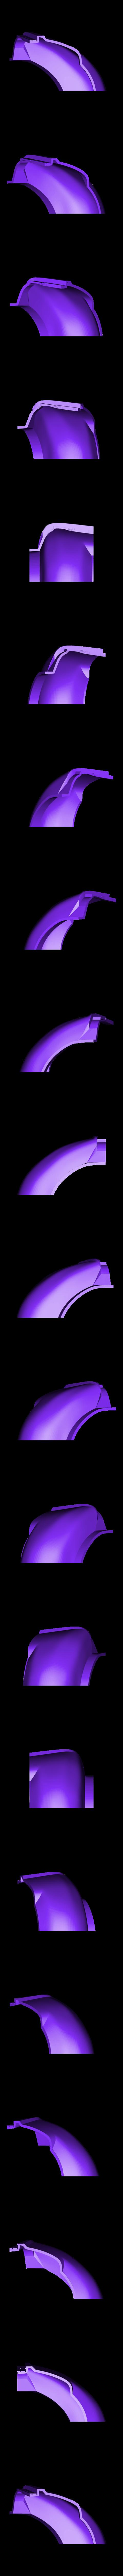 Part 18 v3.stl Download free STL file Clone Trooper Helmet Phase 2 Star Wars • 3D printable template, VillainousPropShop